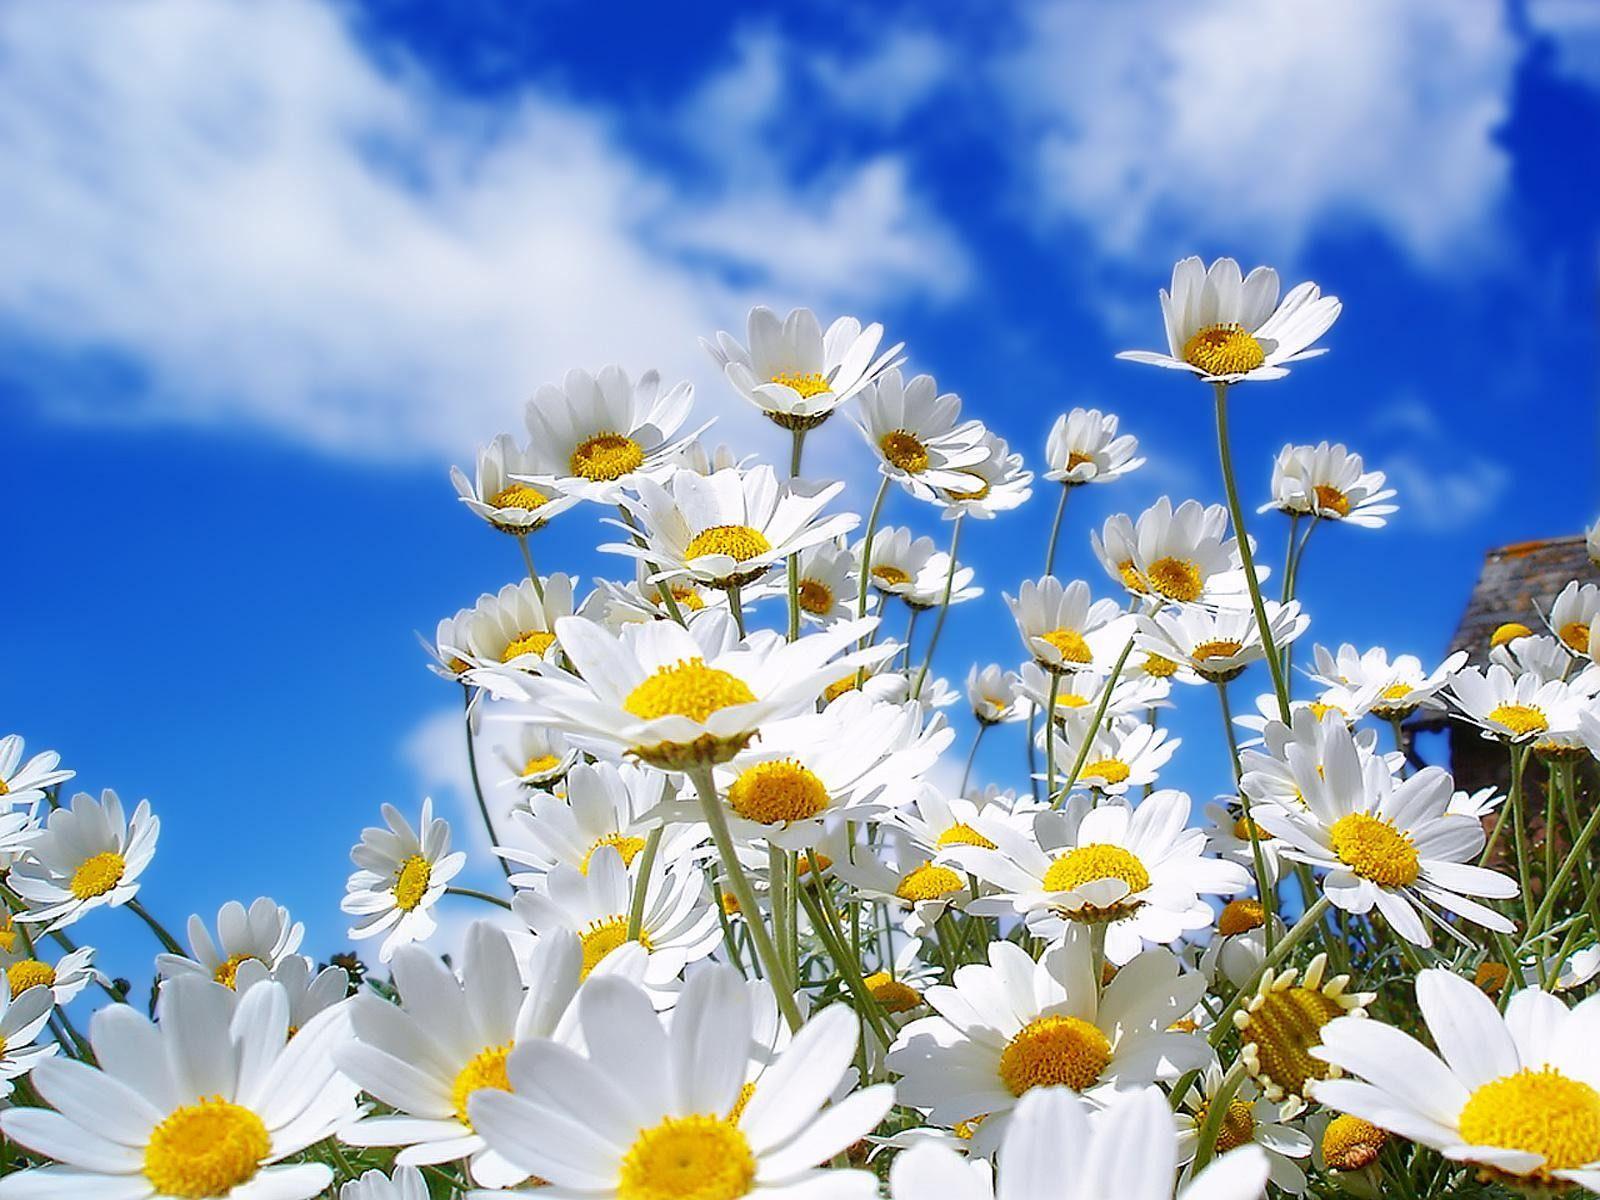 YouWall Pretty Spring Flowers Wallpaper wallpaper